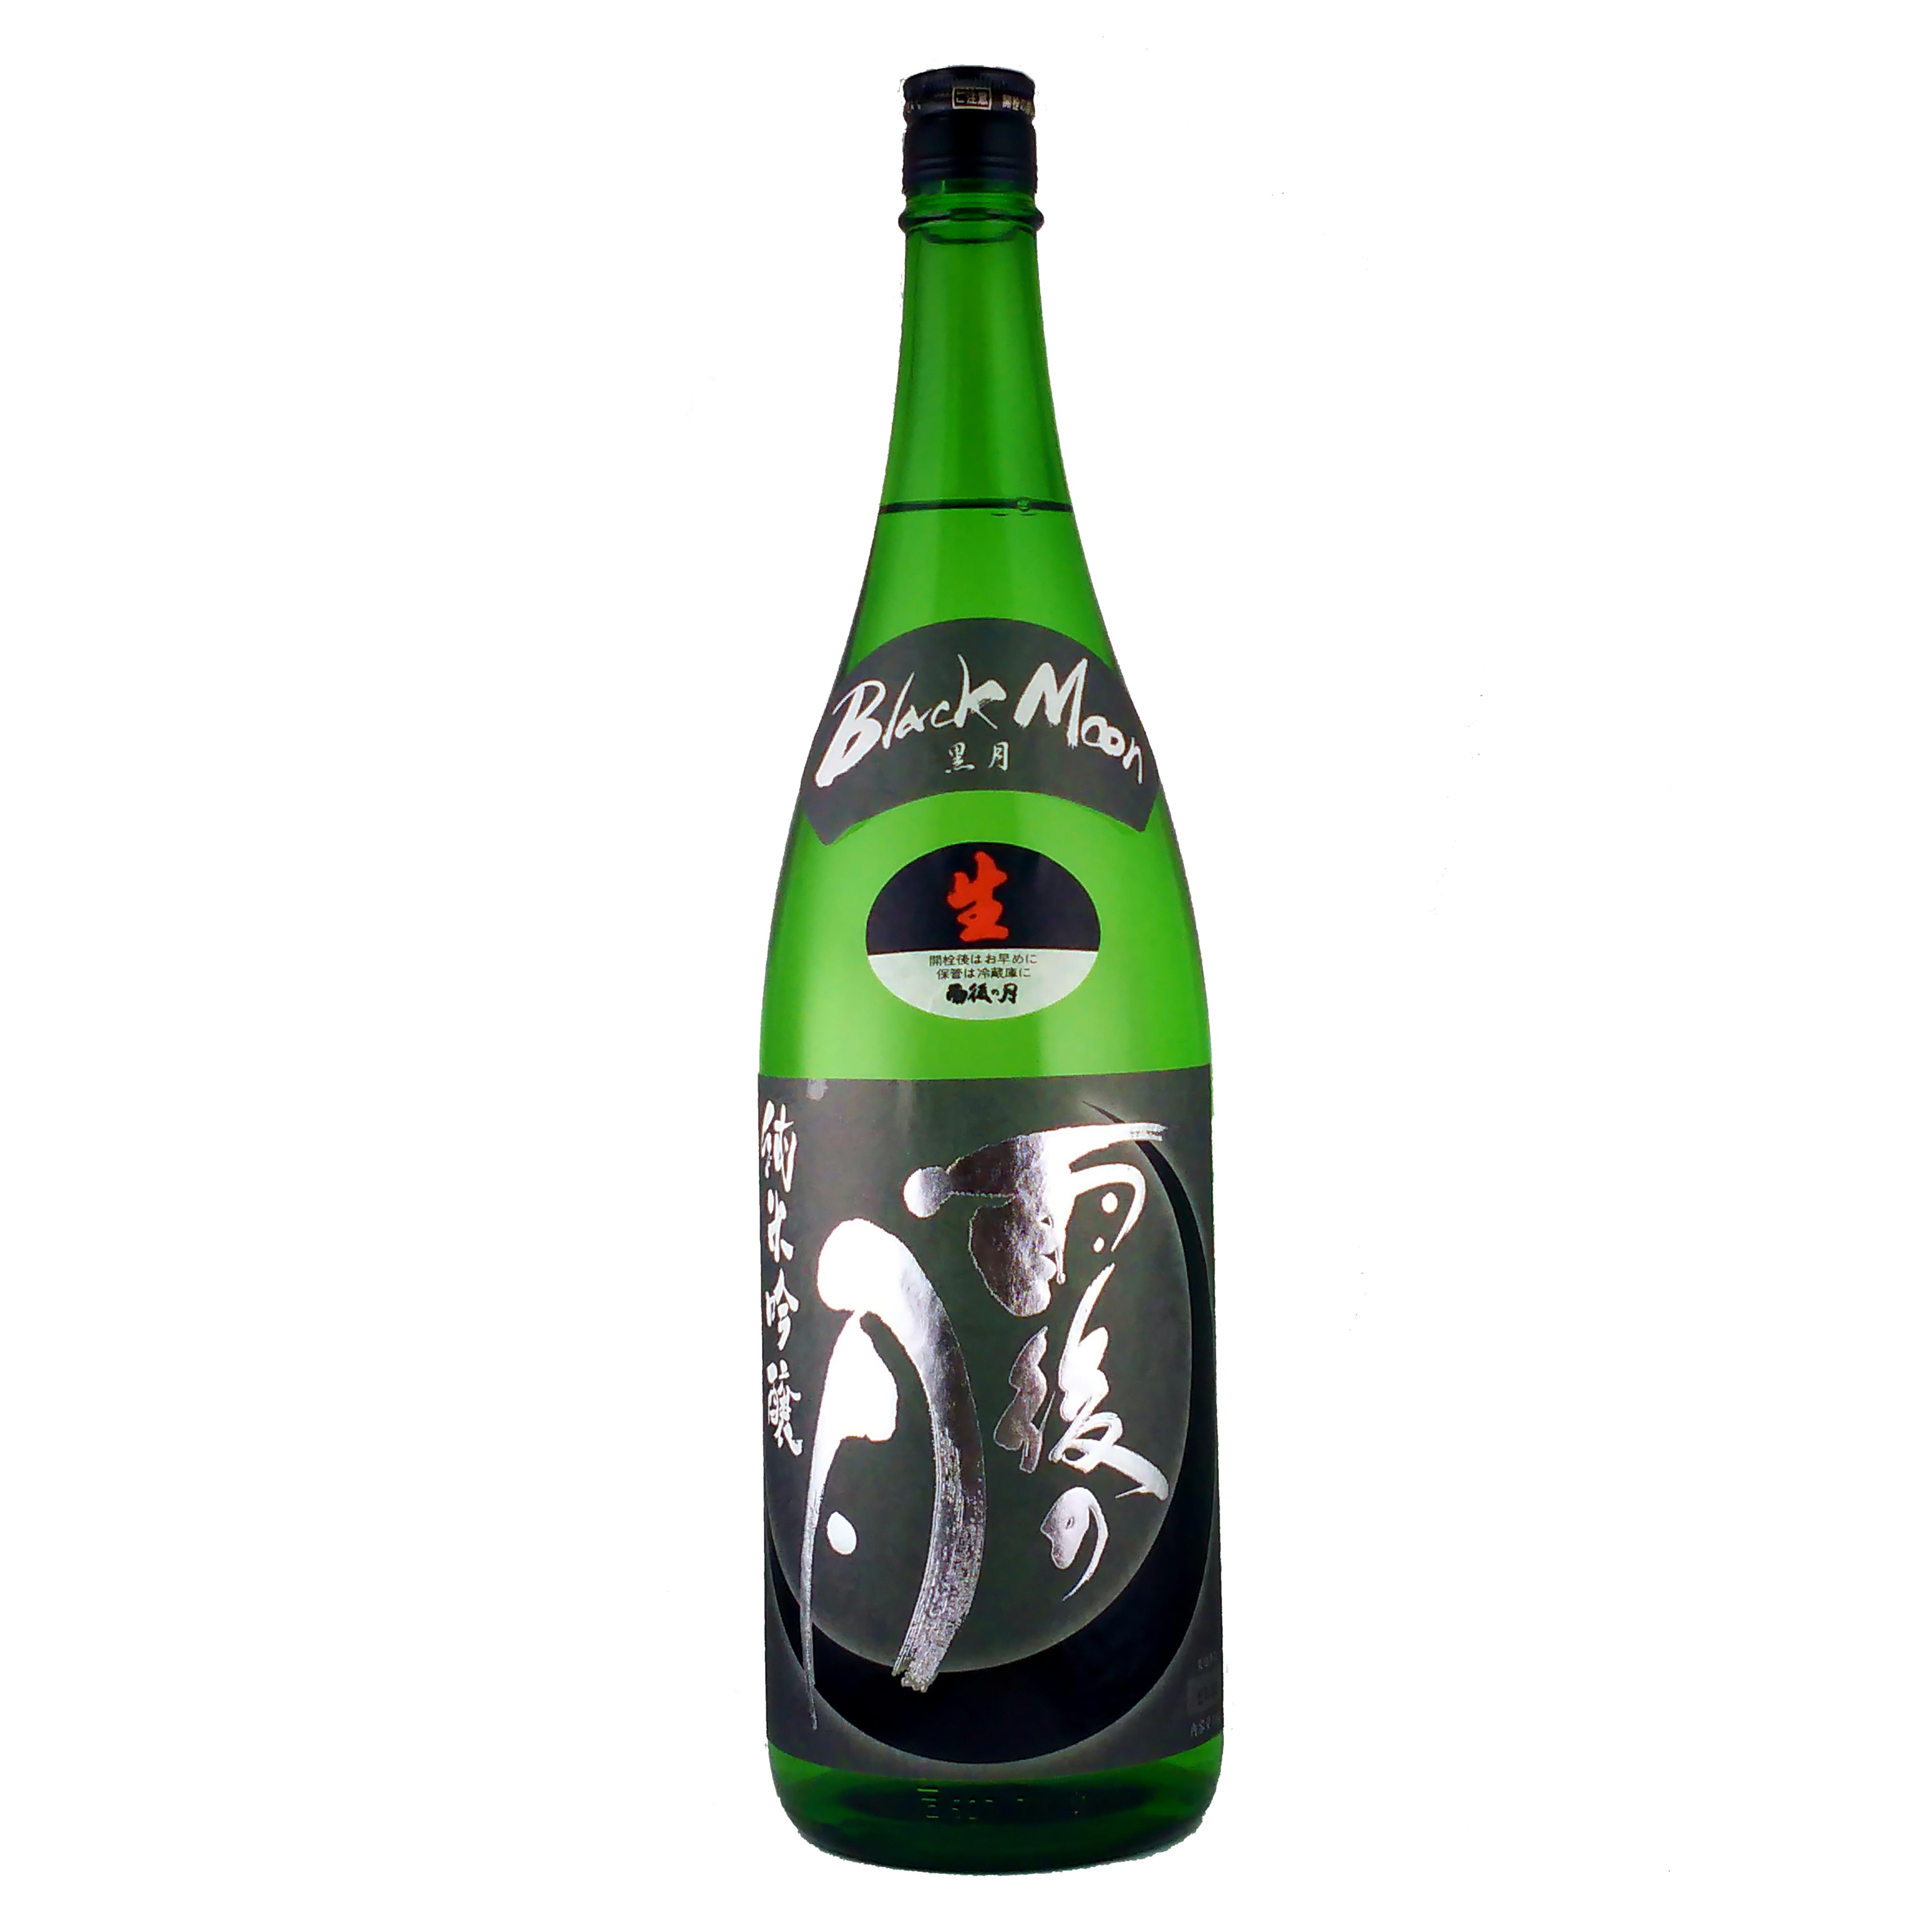 雨後の月 Black Moon 純米大吟醸 生酒 1800ml